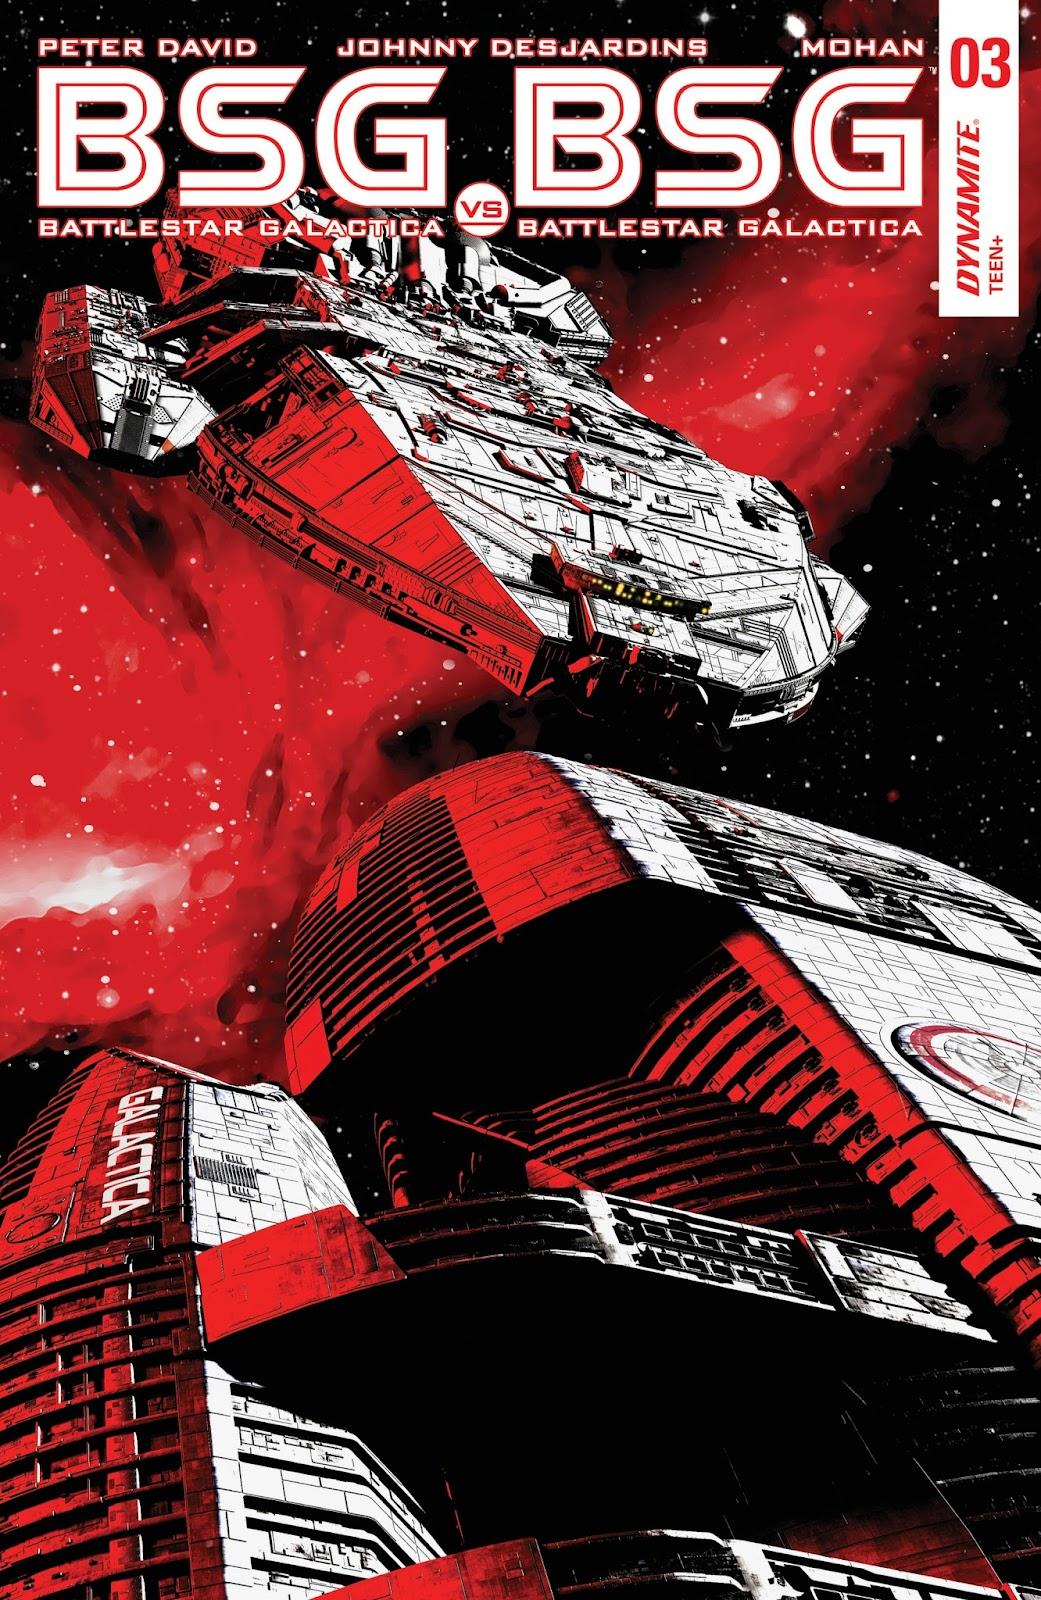 Battlestar Galactica BSG vs. BSG issue 3 - Page 1